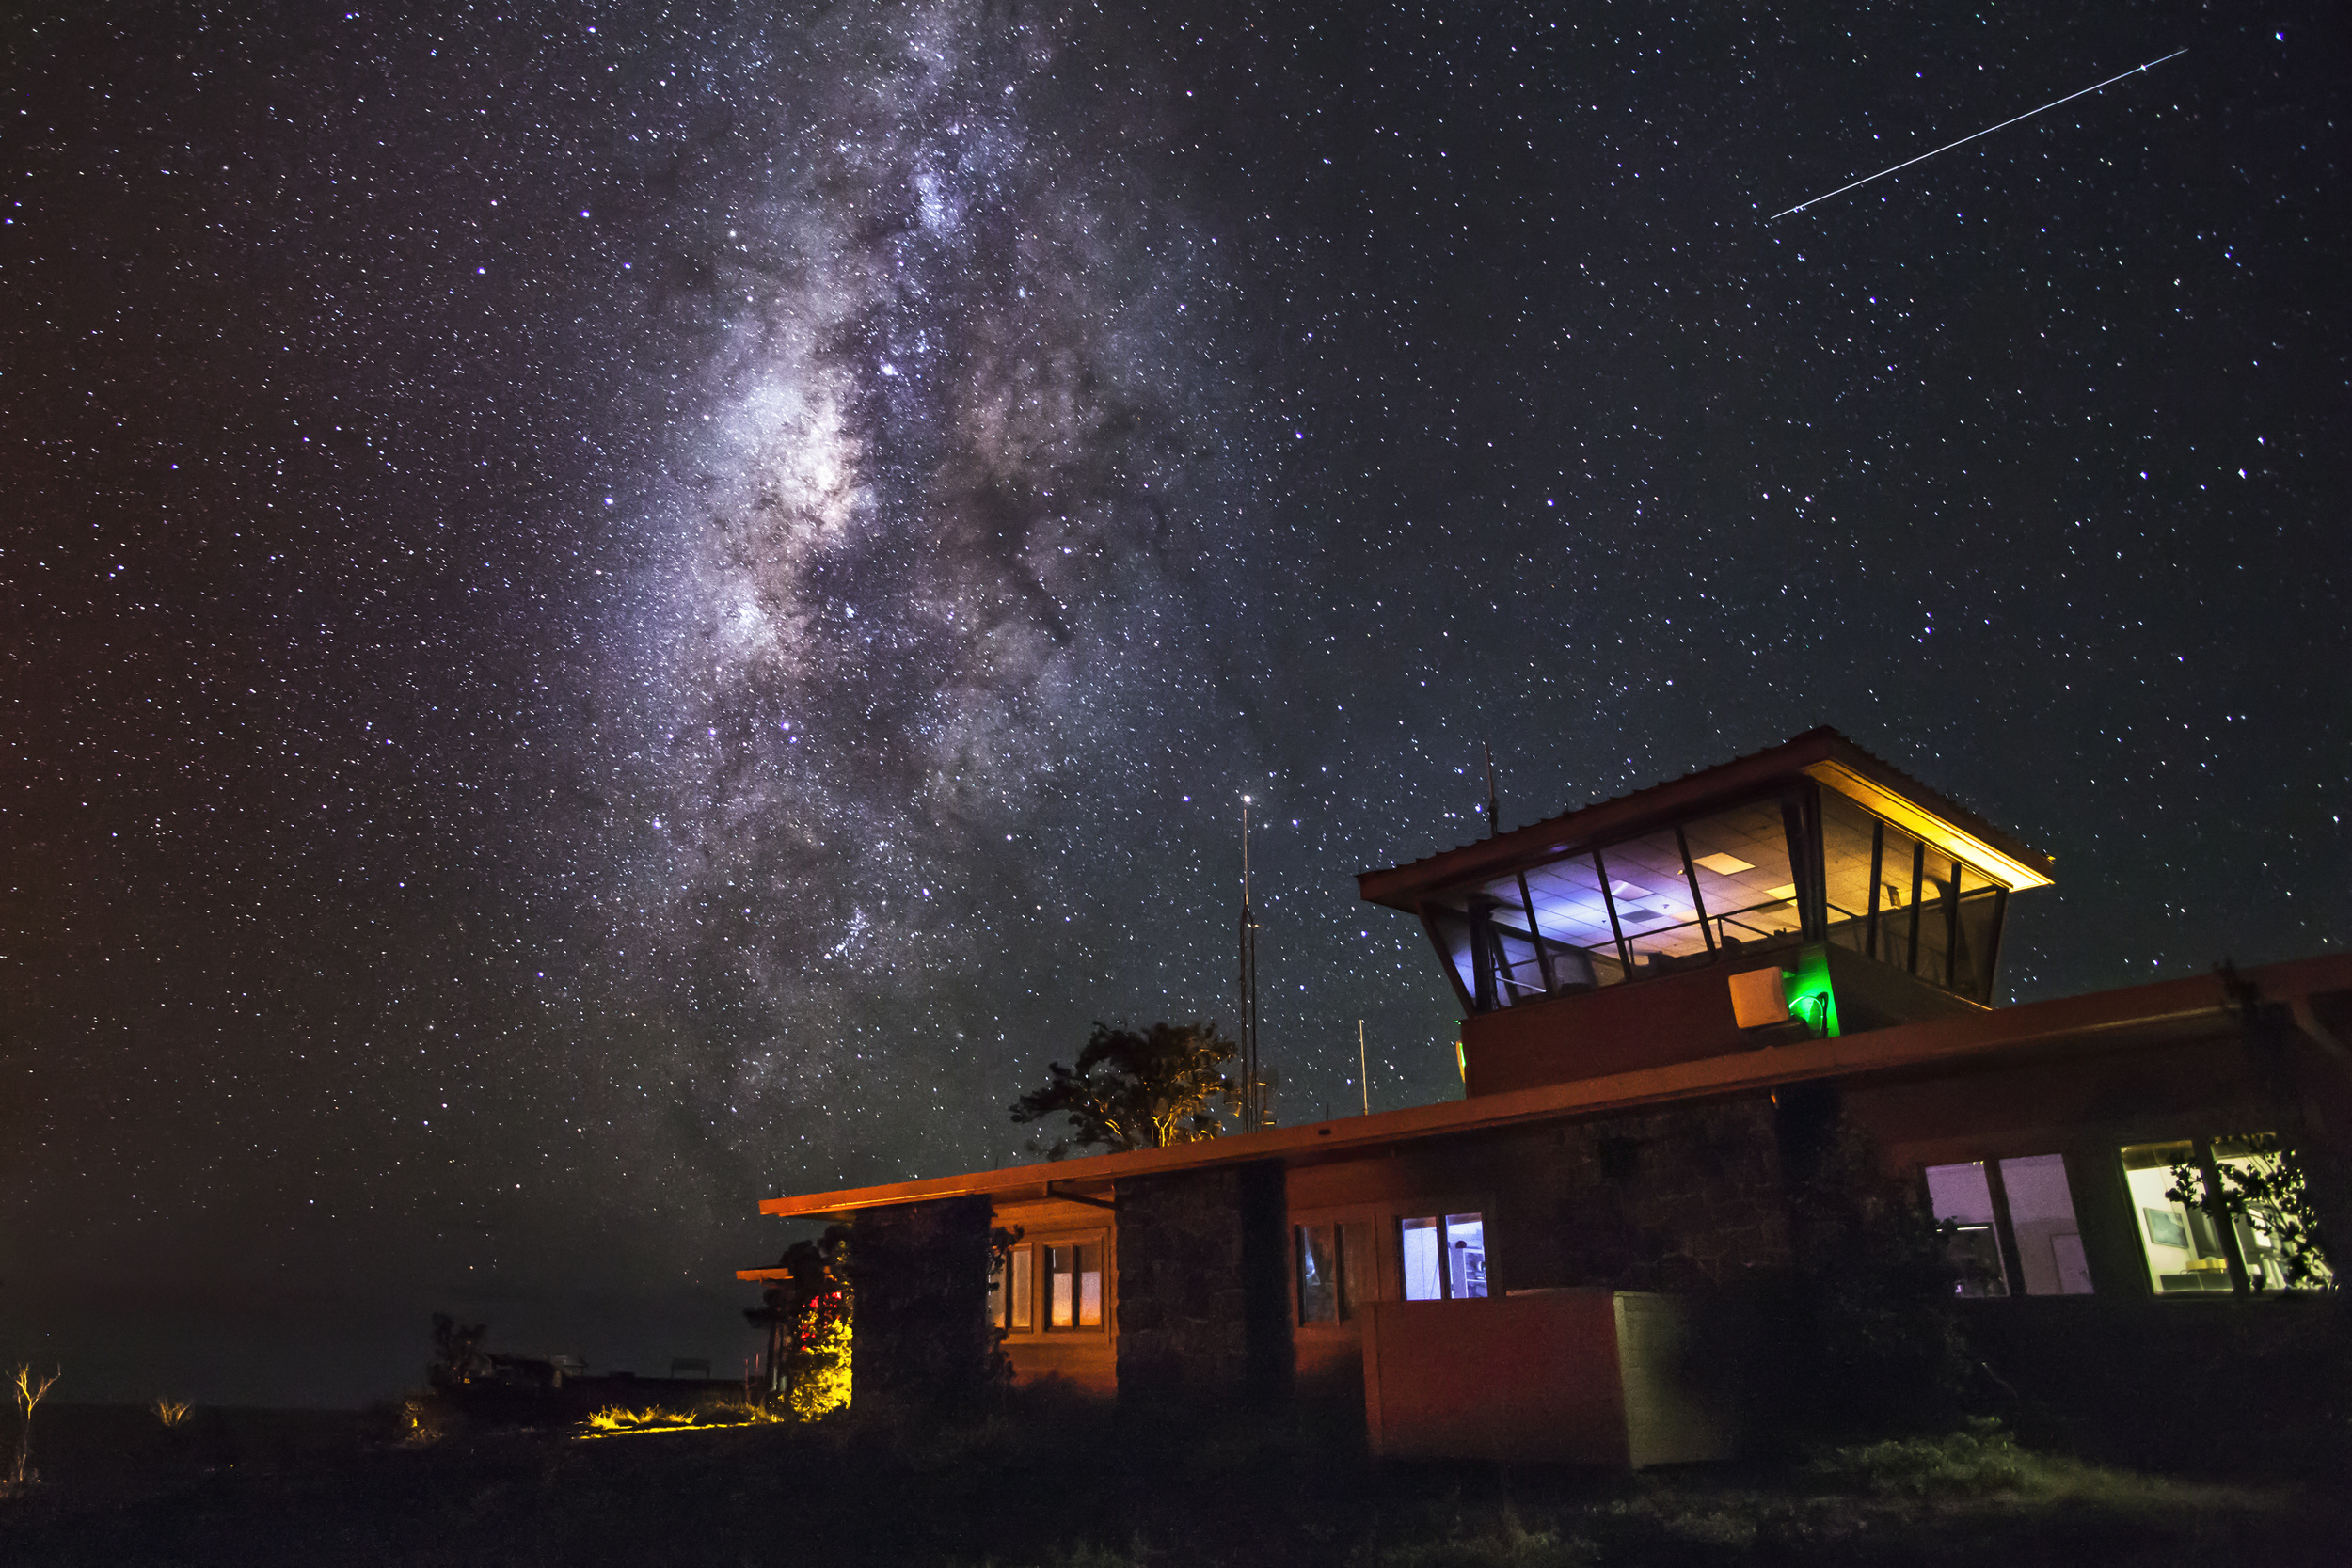 The Milky Way over the Jaggar Museum on the Big Island of Hawaii